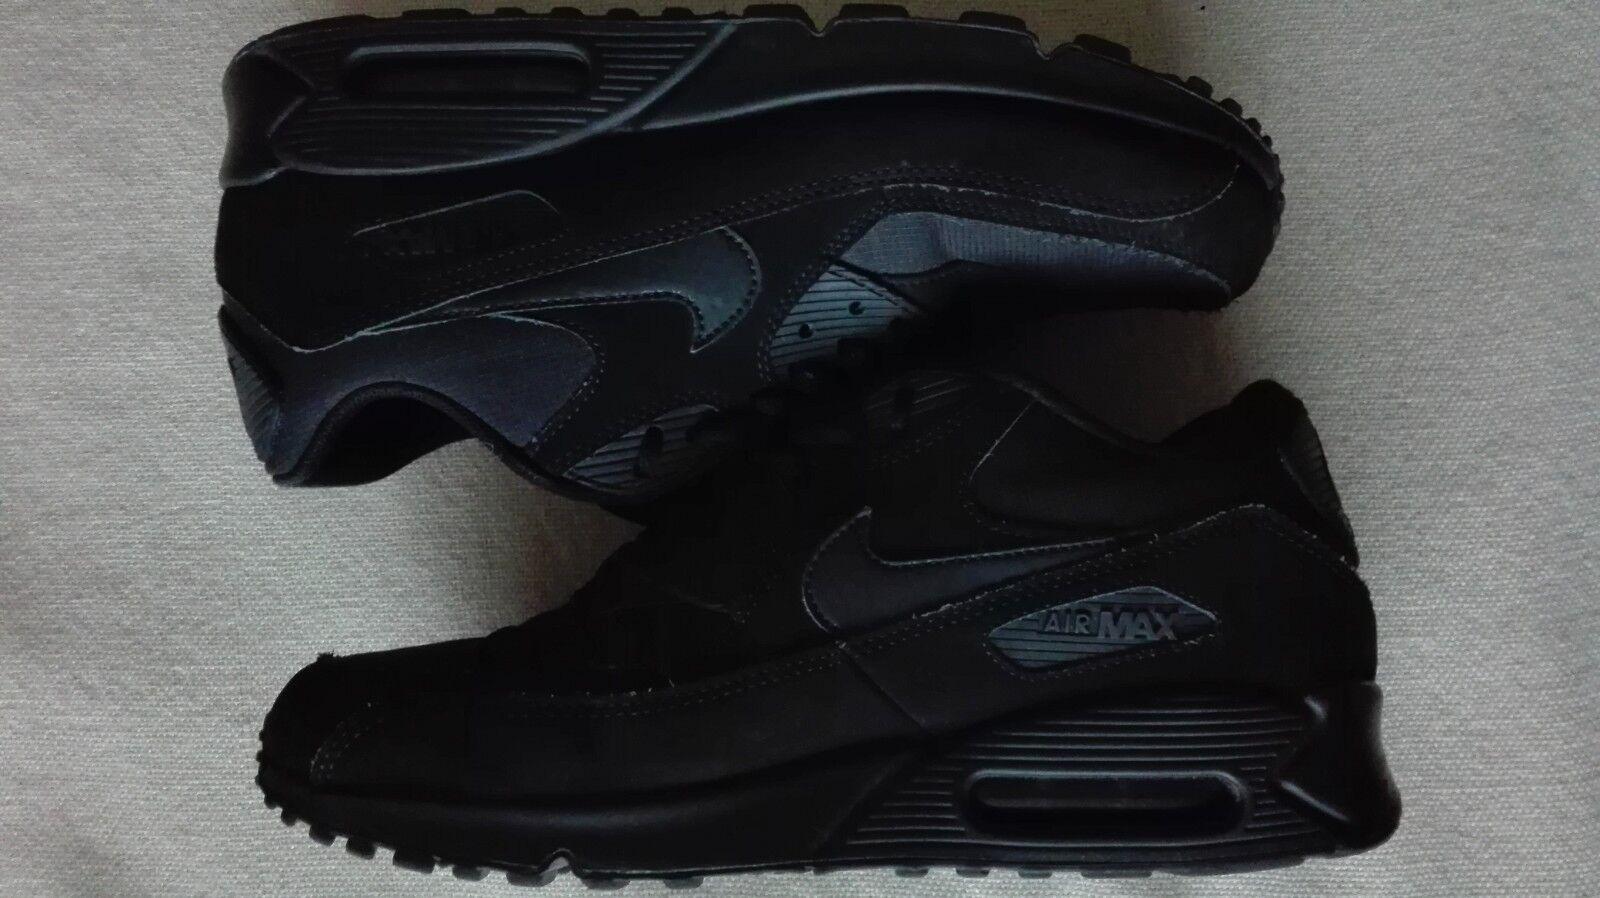 Nike Air Max triple black trainers - size 10 (VGC)